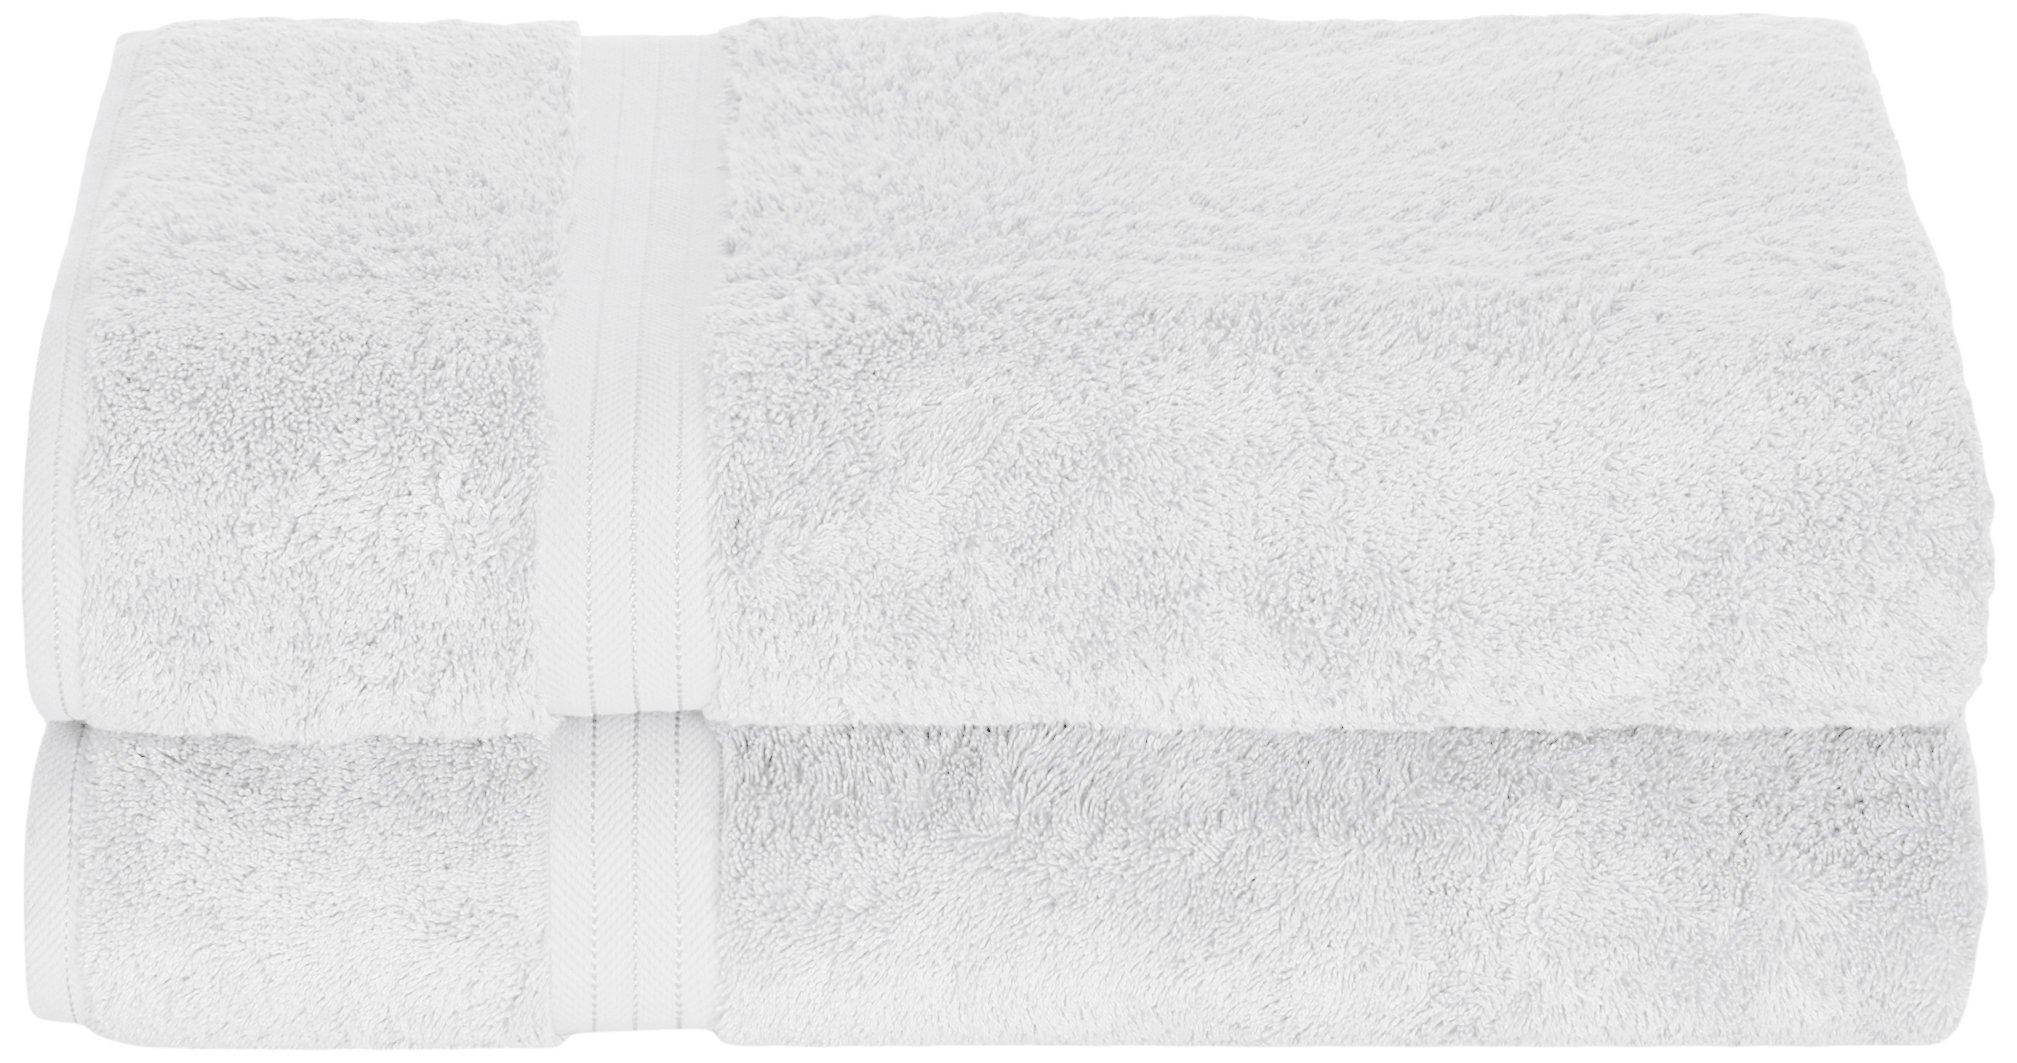 Daisy House pcs 2 Piece Bamboo Sheets, White